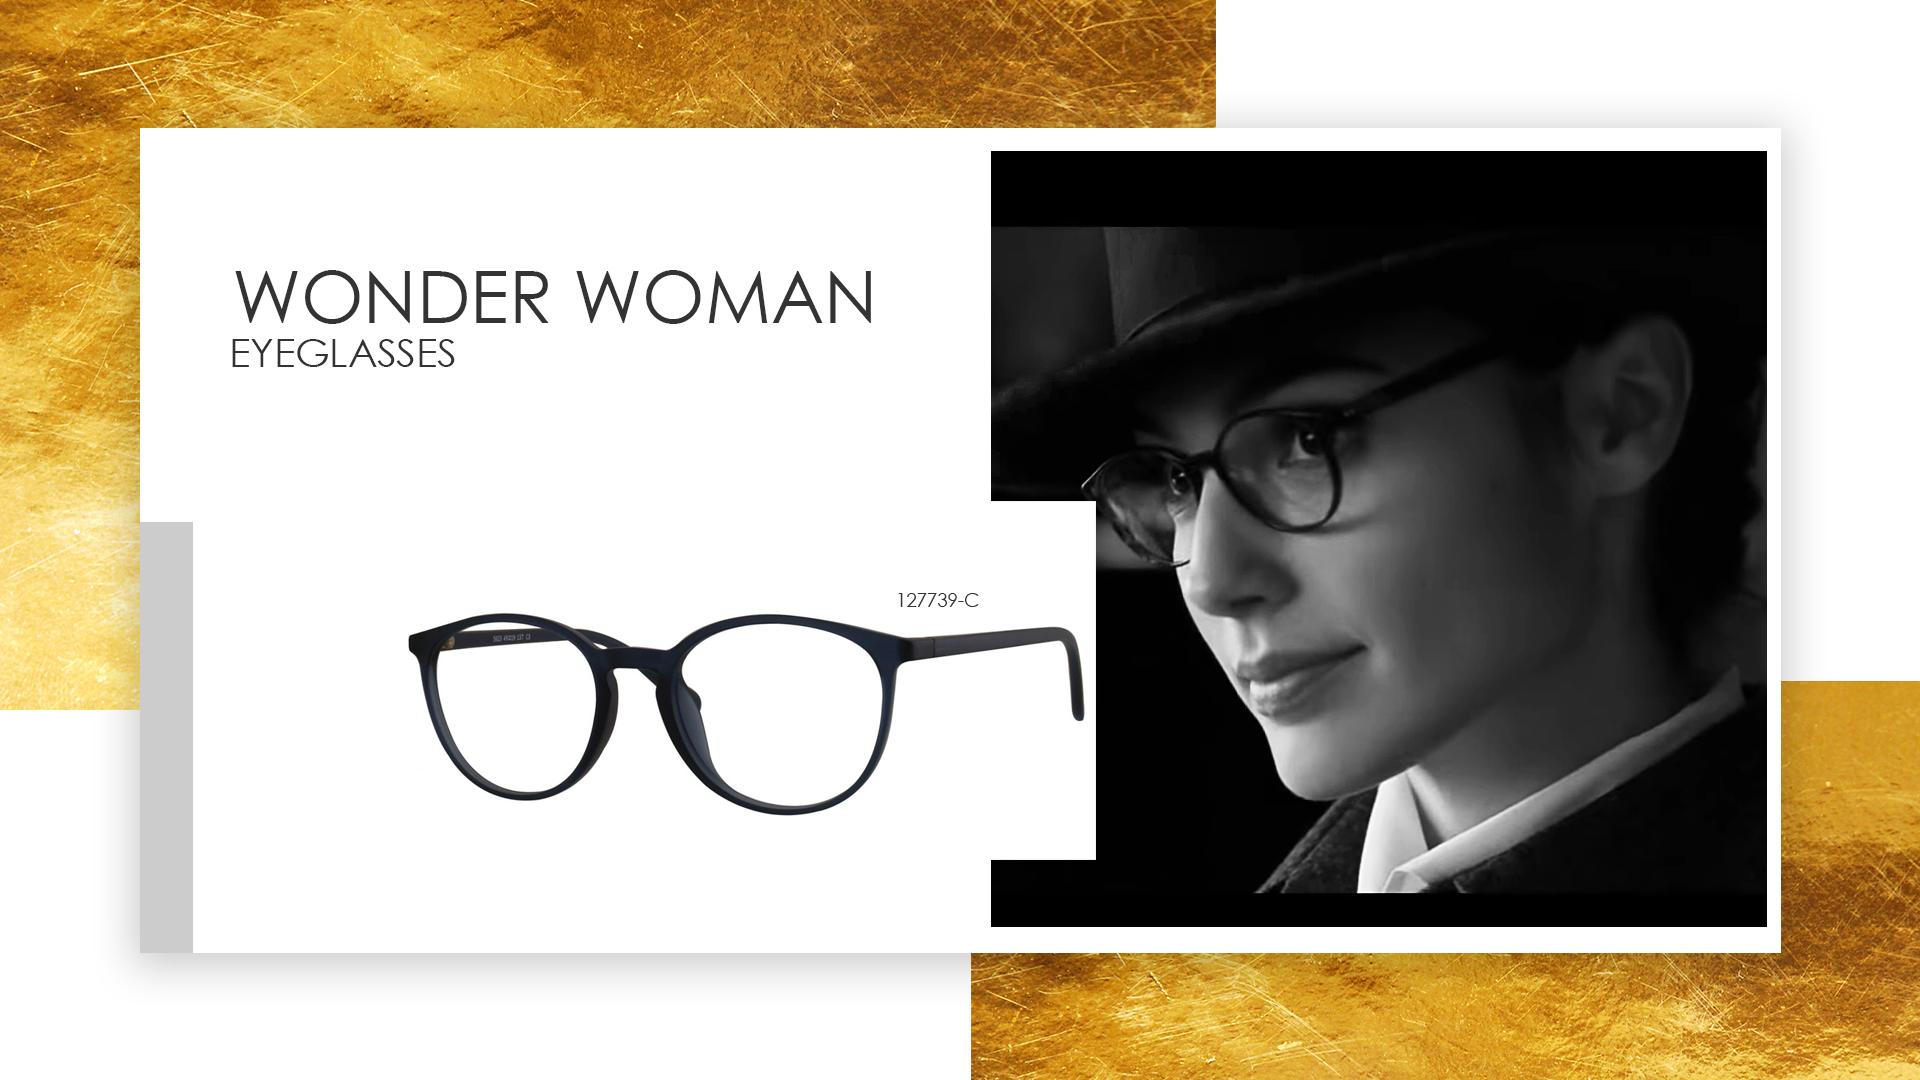 3 -Get Diana Prince (Wonder Woman) Frame: